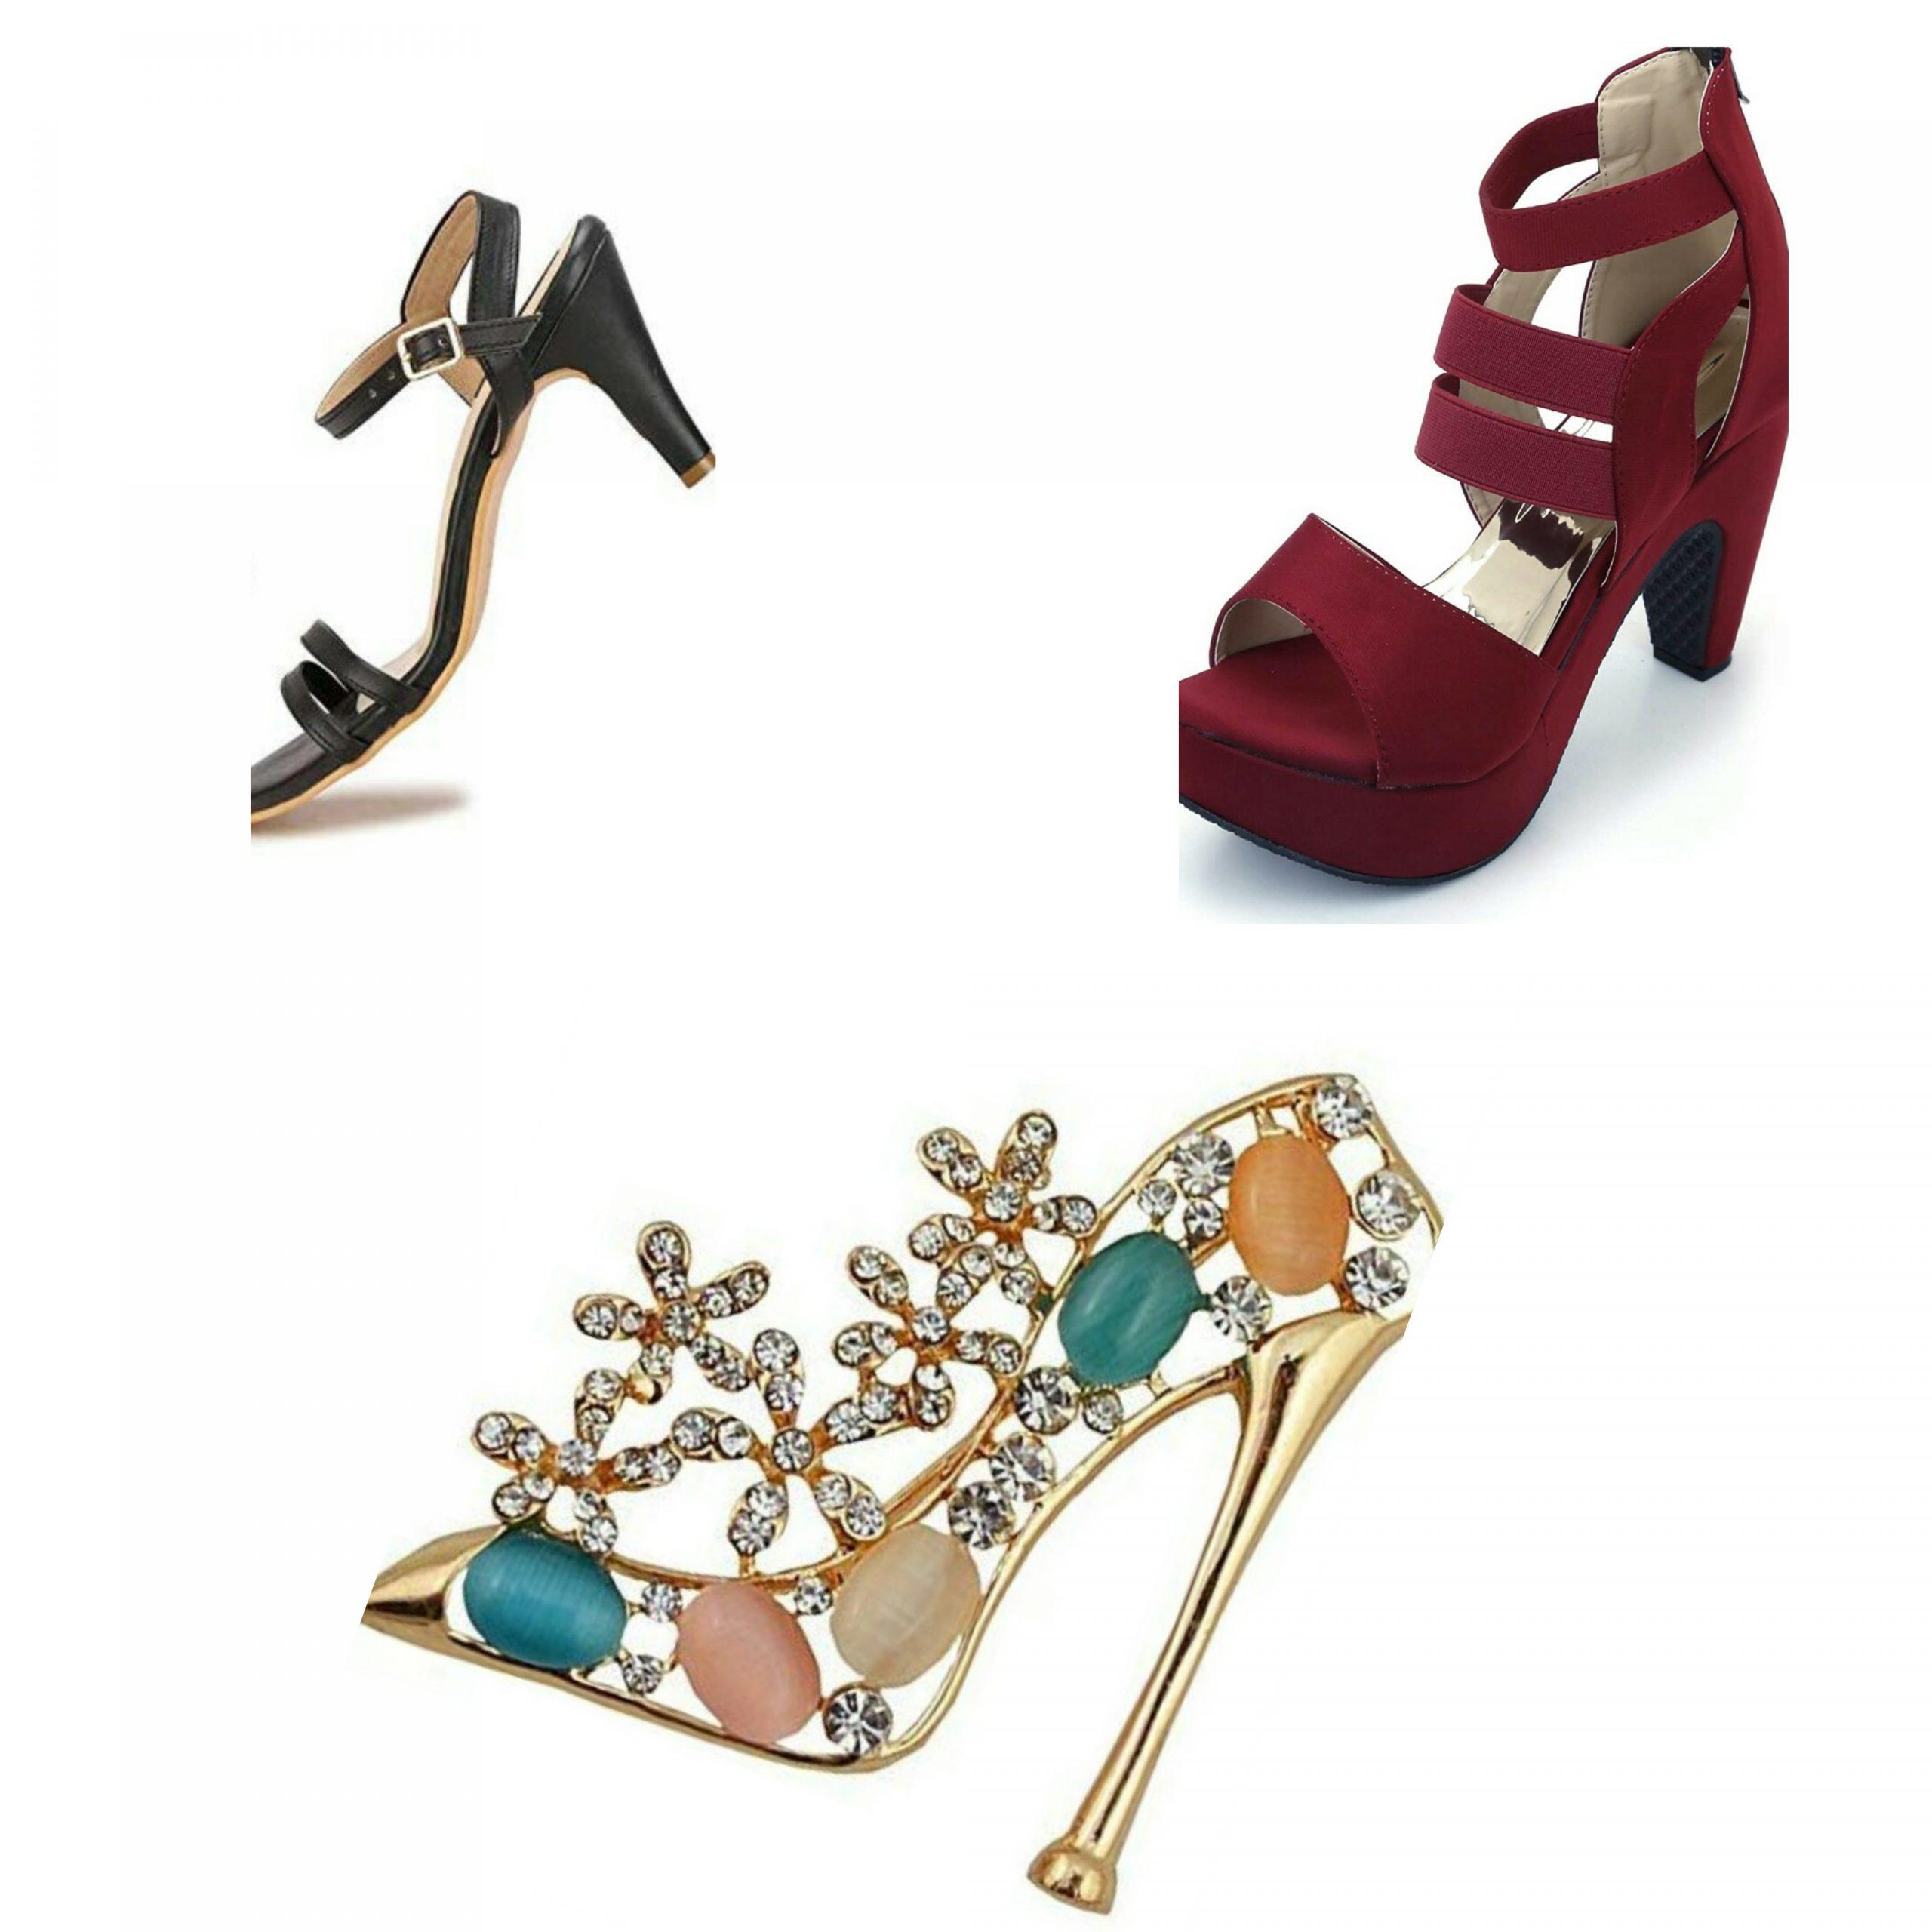 Wearing high heels may affect women's bone health